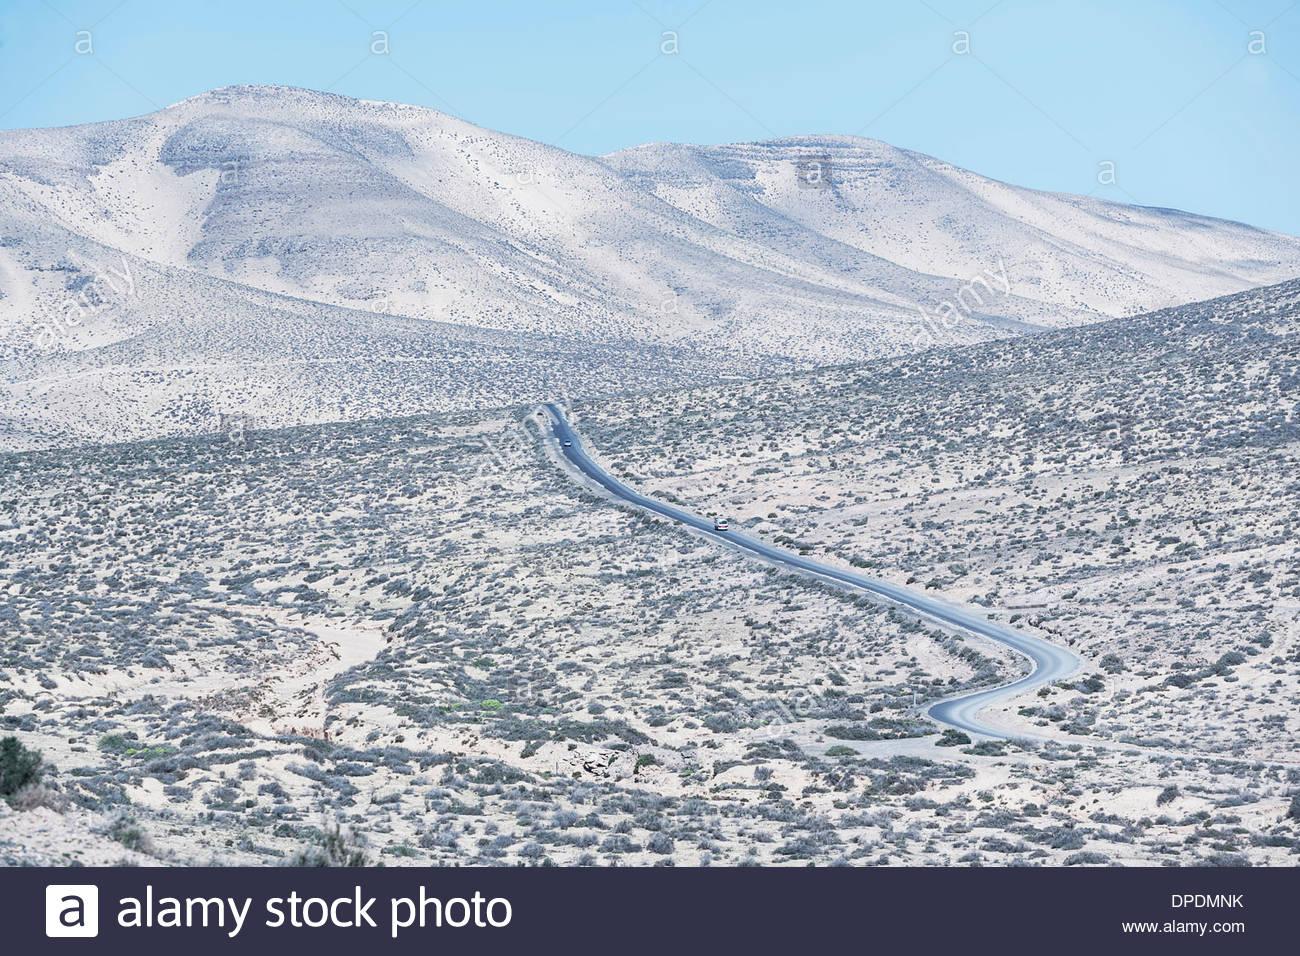 Road winding through Fuerteventura landscape, Canary Islands, Spain - Stock Image